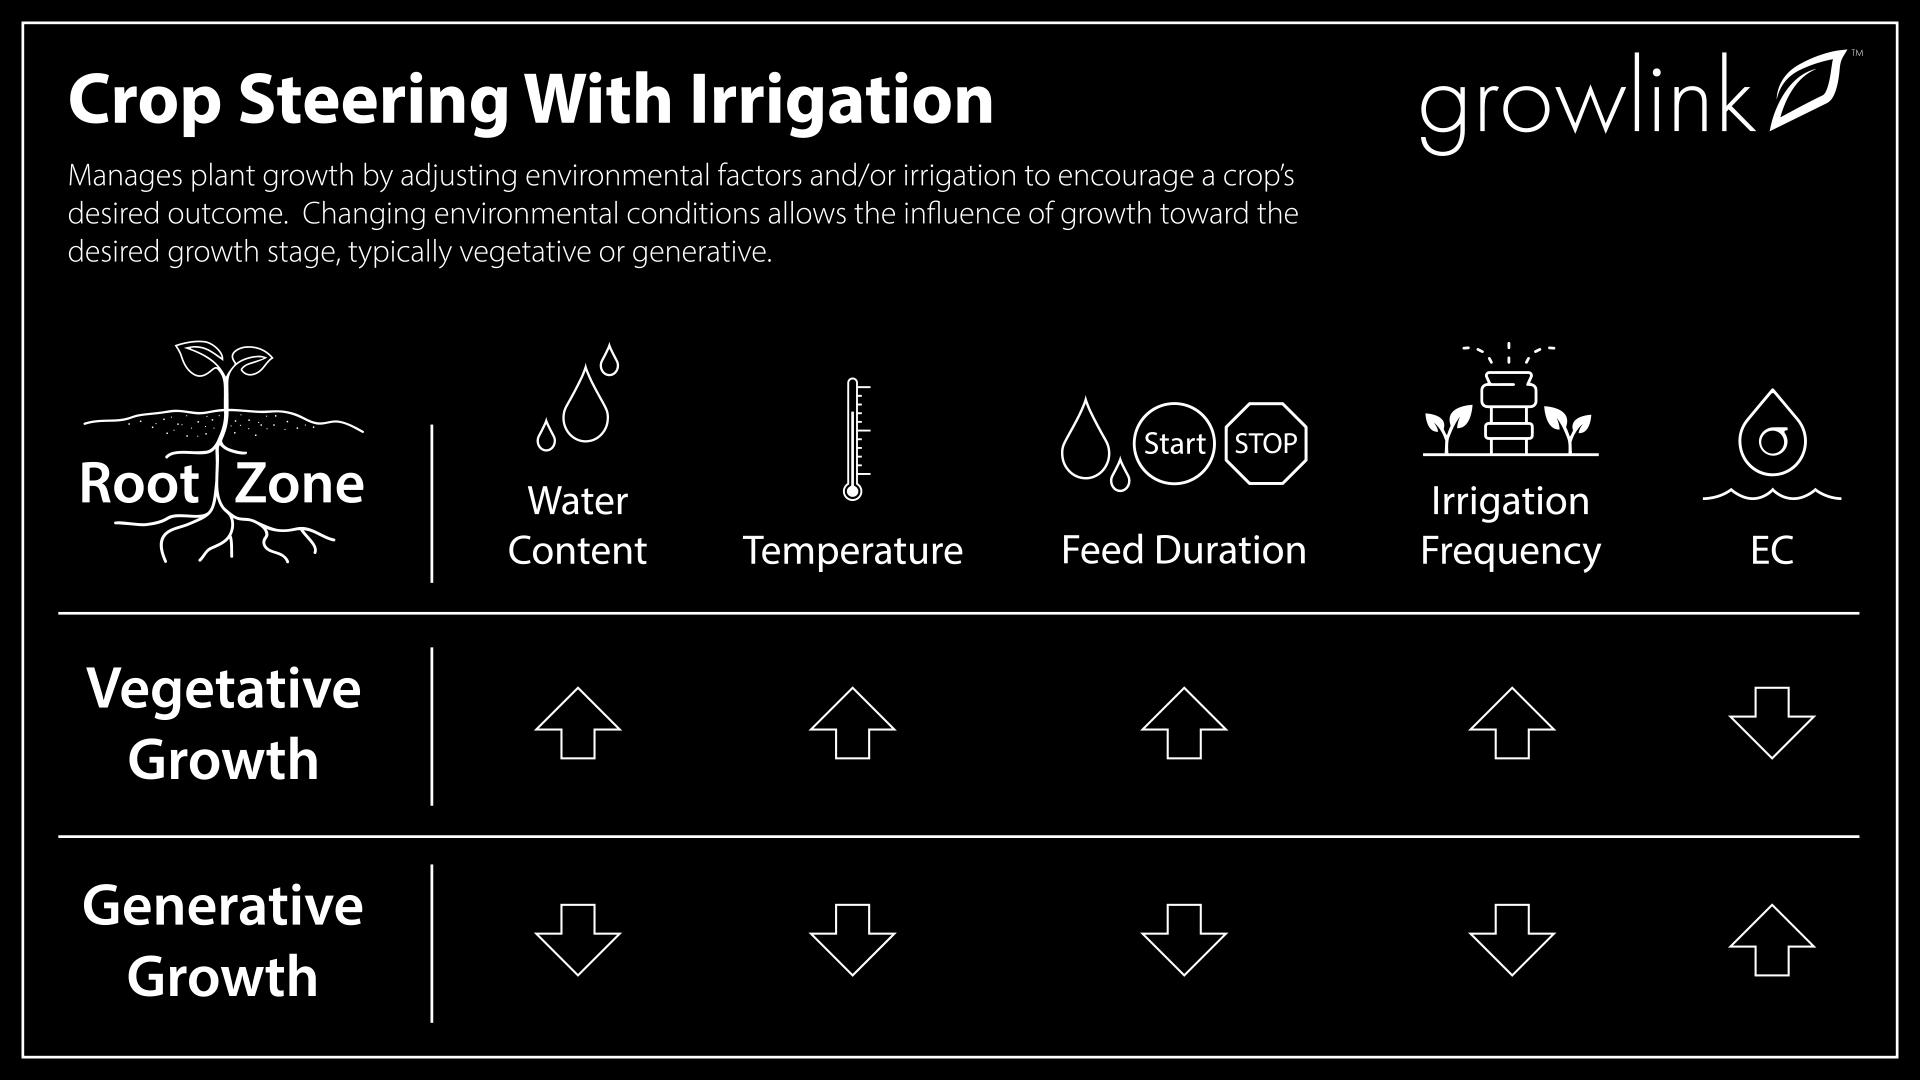 Growlink_Crop-Steering-Irrigation-Infographic_Arrows (1)